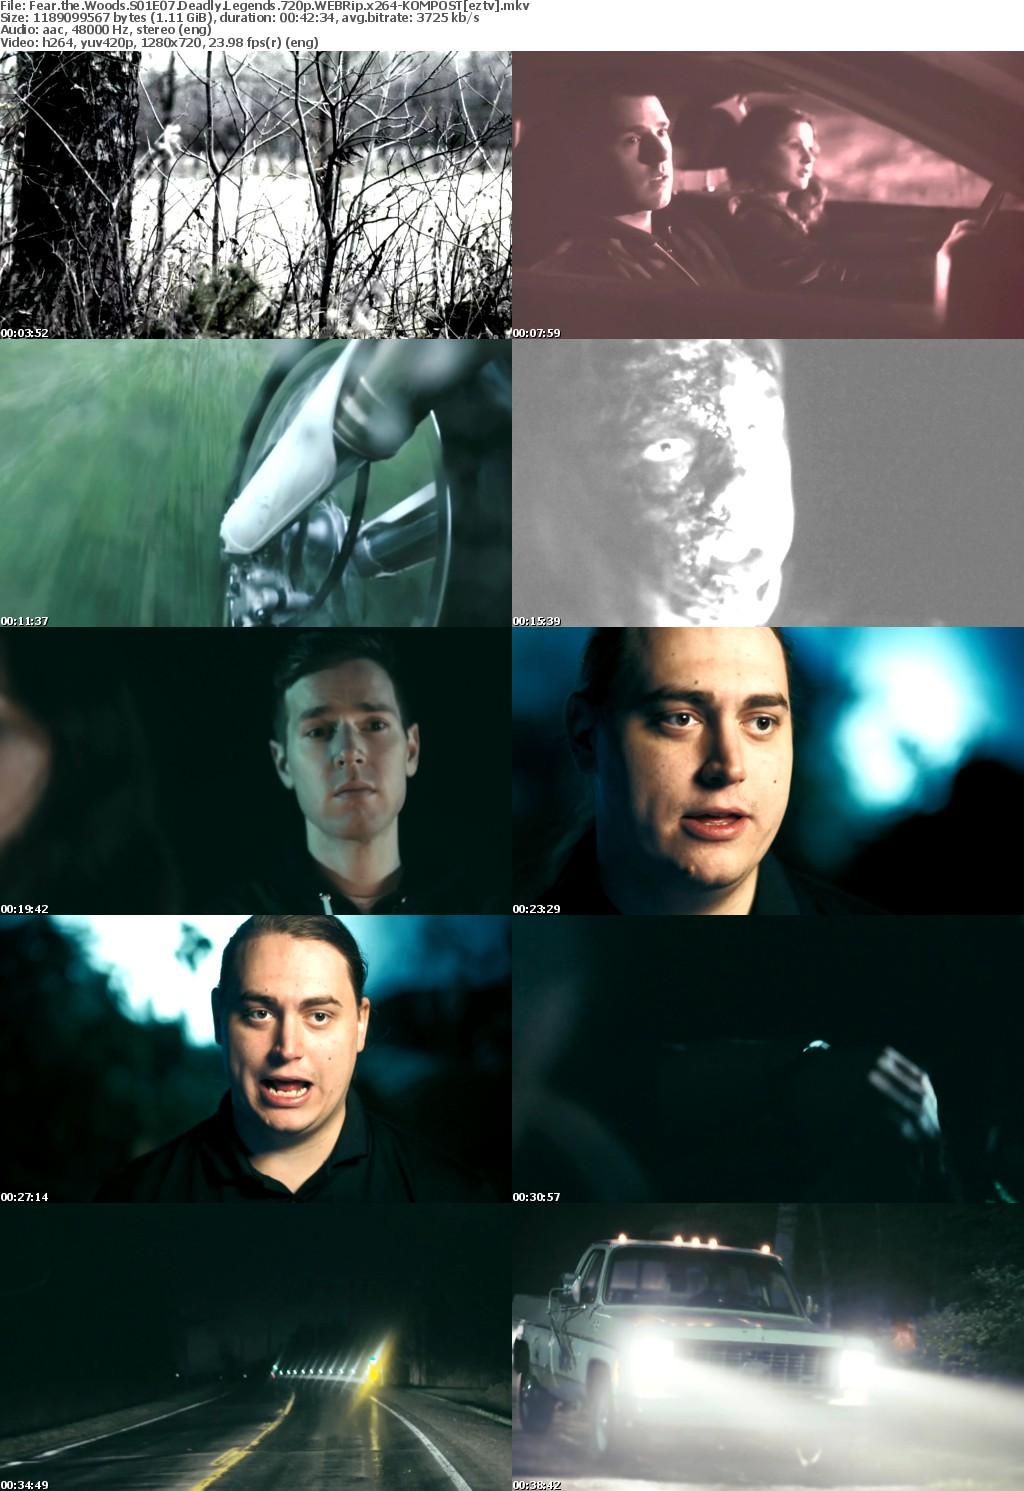 Fear the Woods S01E07 Deadly Legends 720p WEBRip x264-KOMPOST